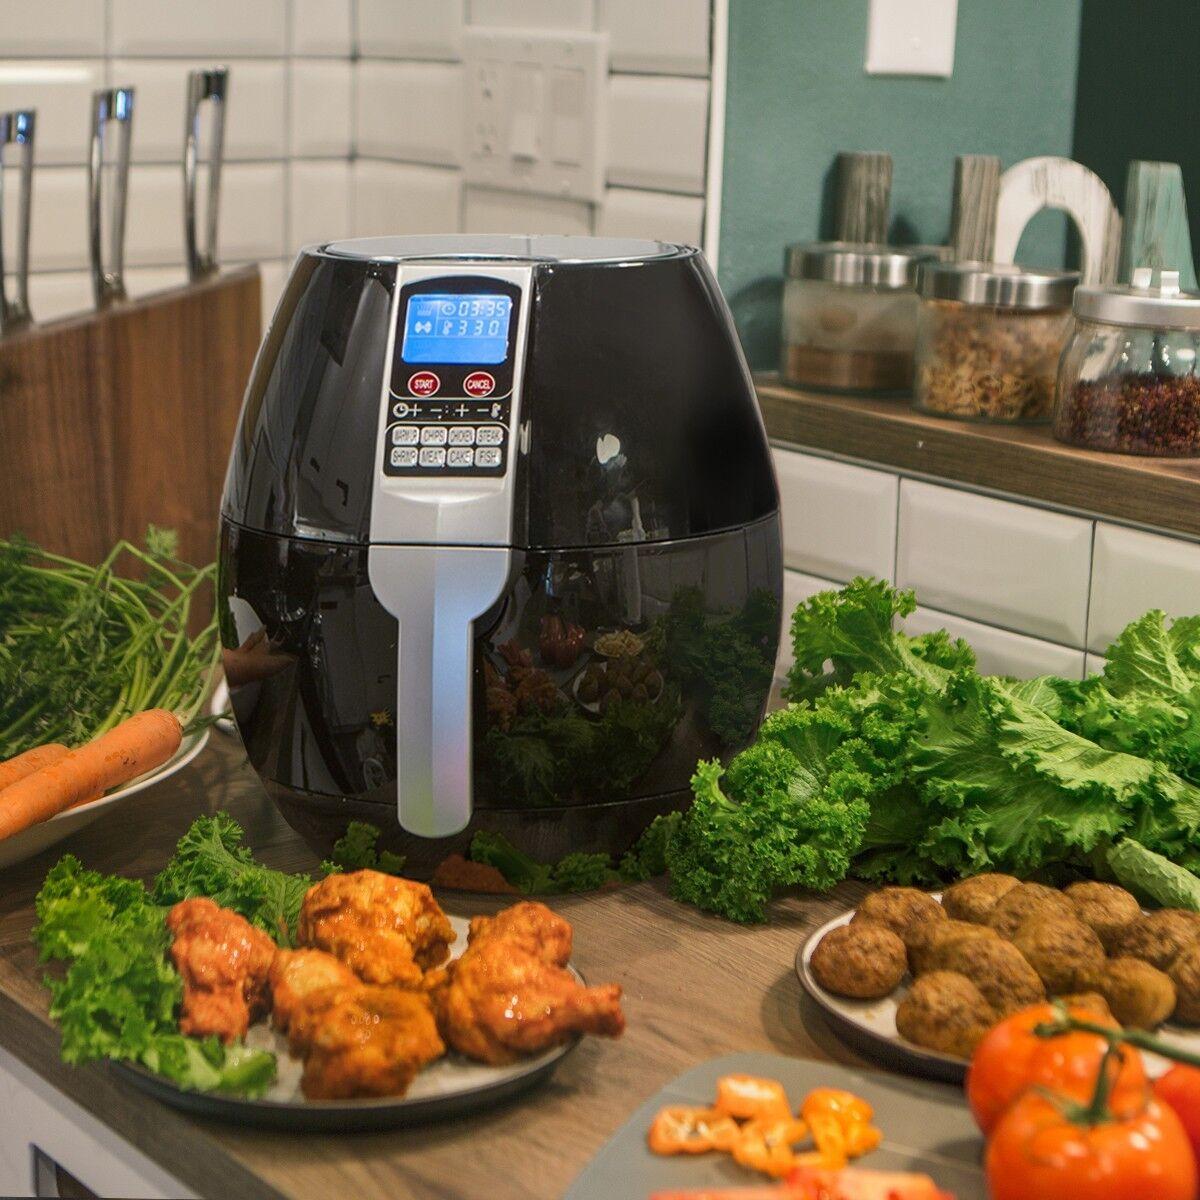 3.7QT 1500W Electric Air Fryer cooker 8 Cooking Menu Setting Digital Display